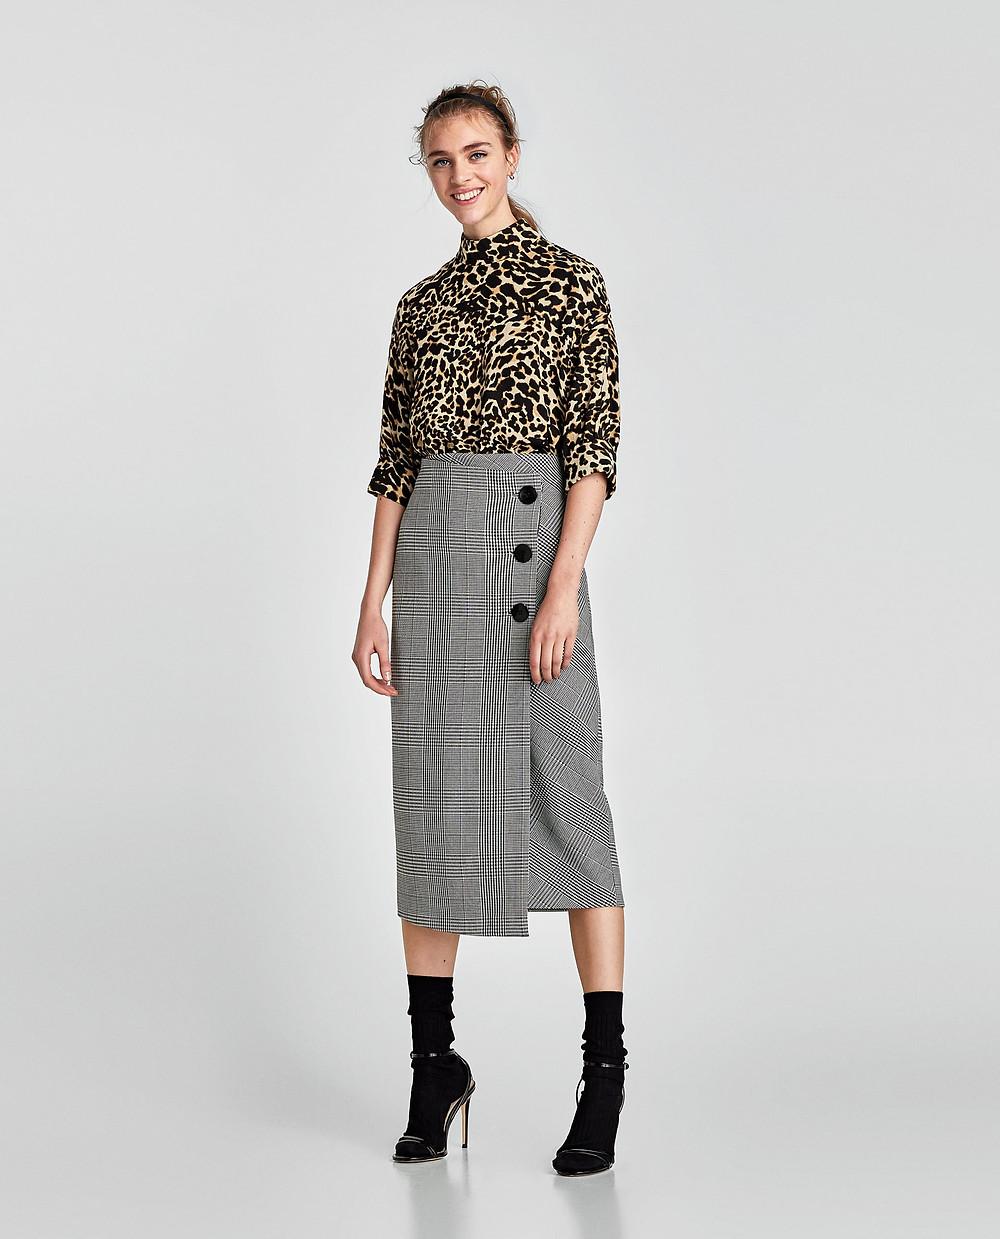 Zara Leopard Print High Neck Top $25.99